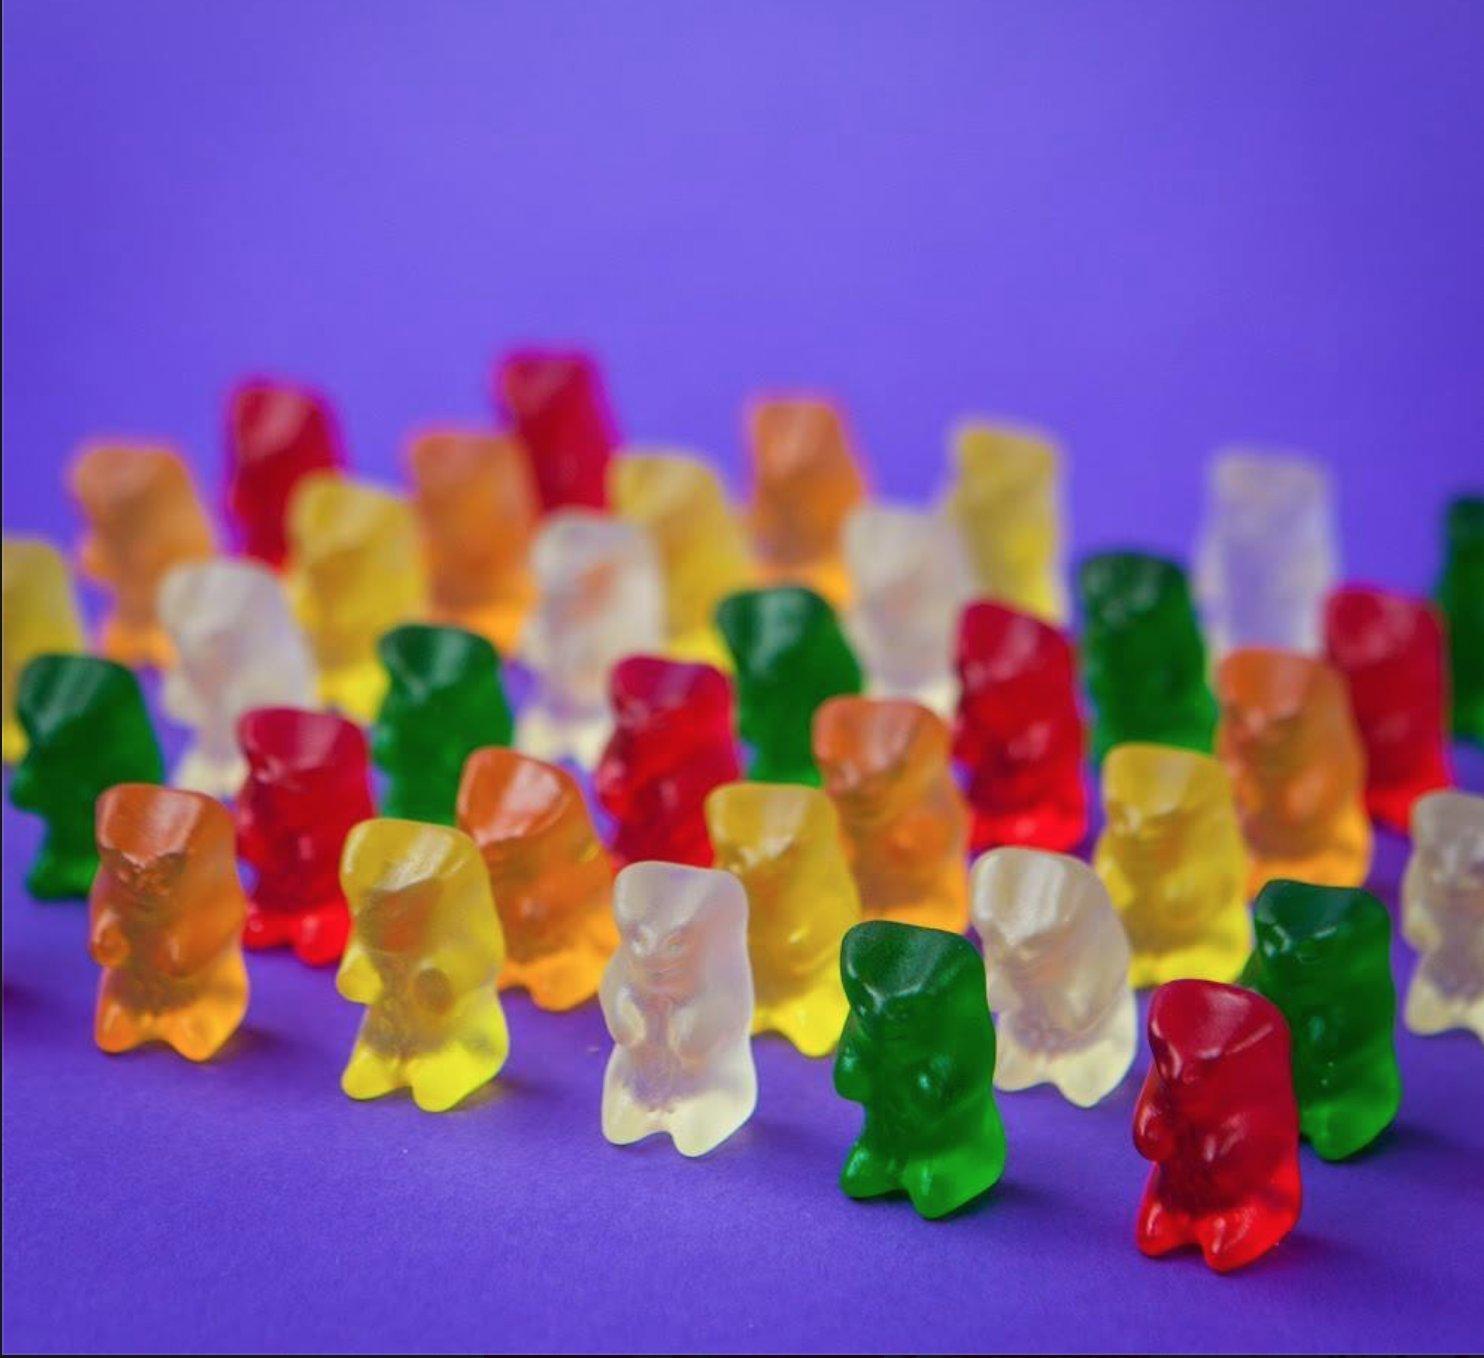 Haribo Gummi Candy, Goldbears Gummy Candy, 48 Ounce Bag (Pack of 4) by Haribo (Image #8)